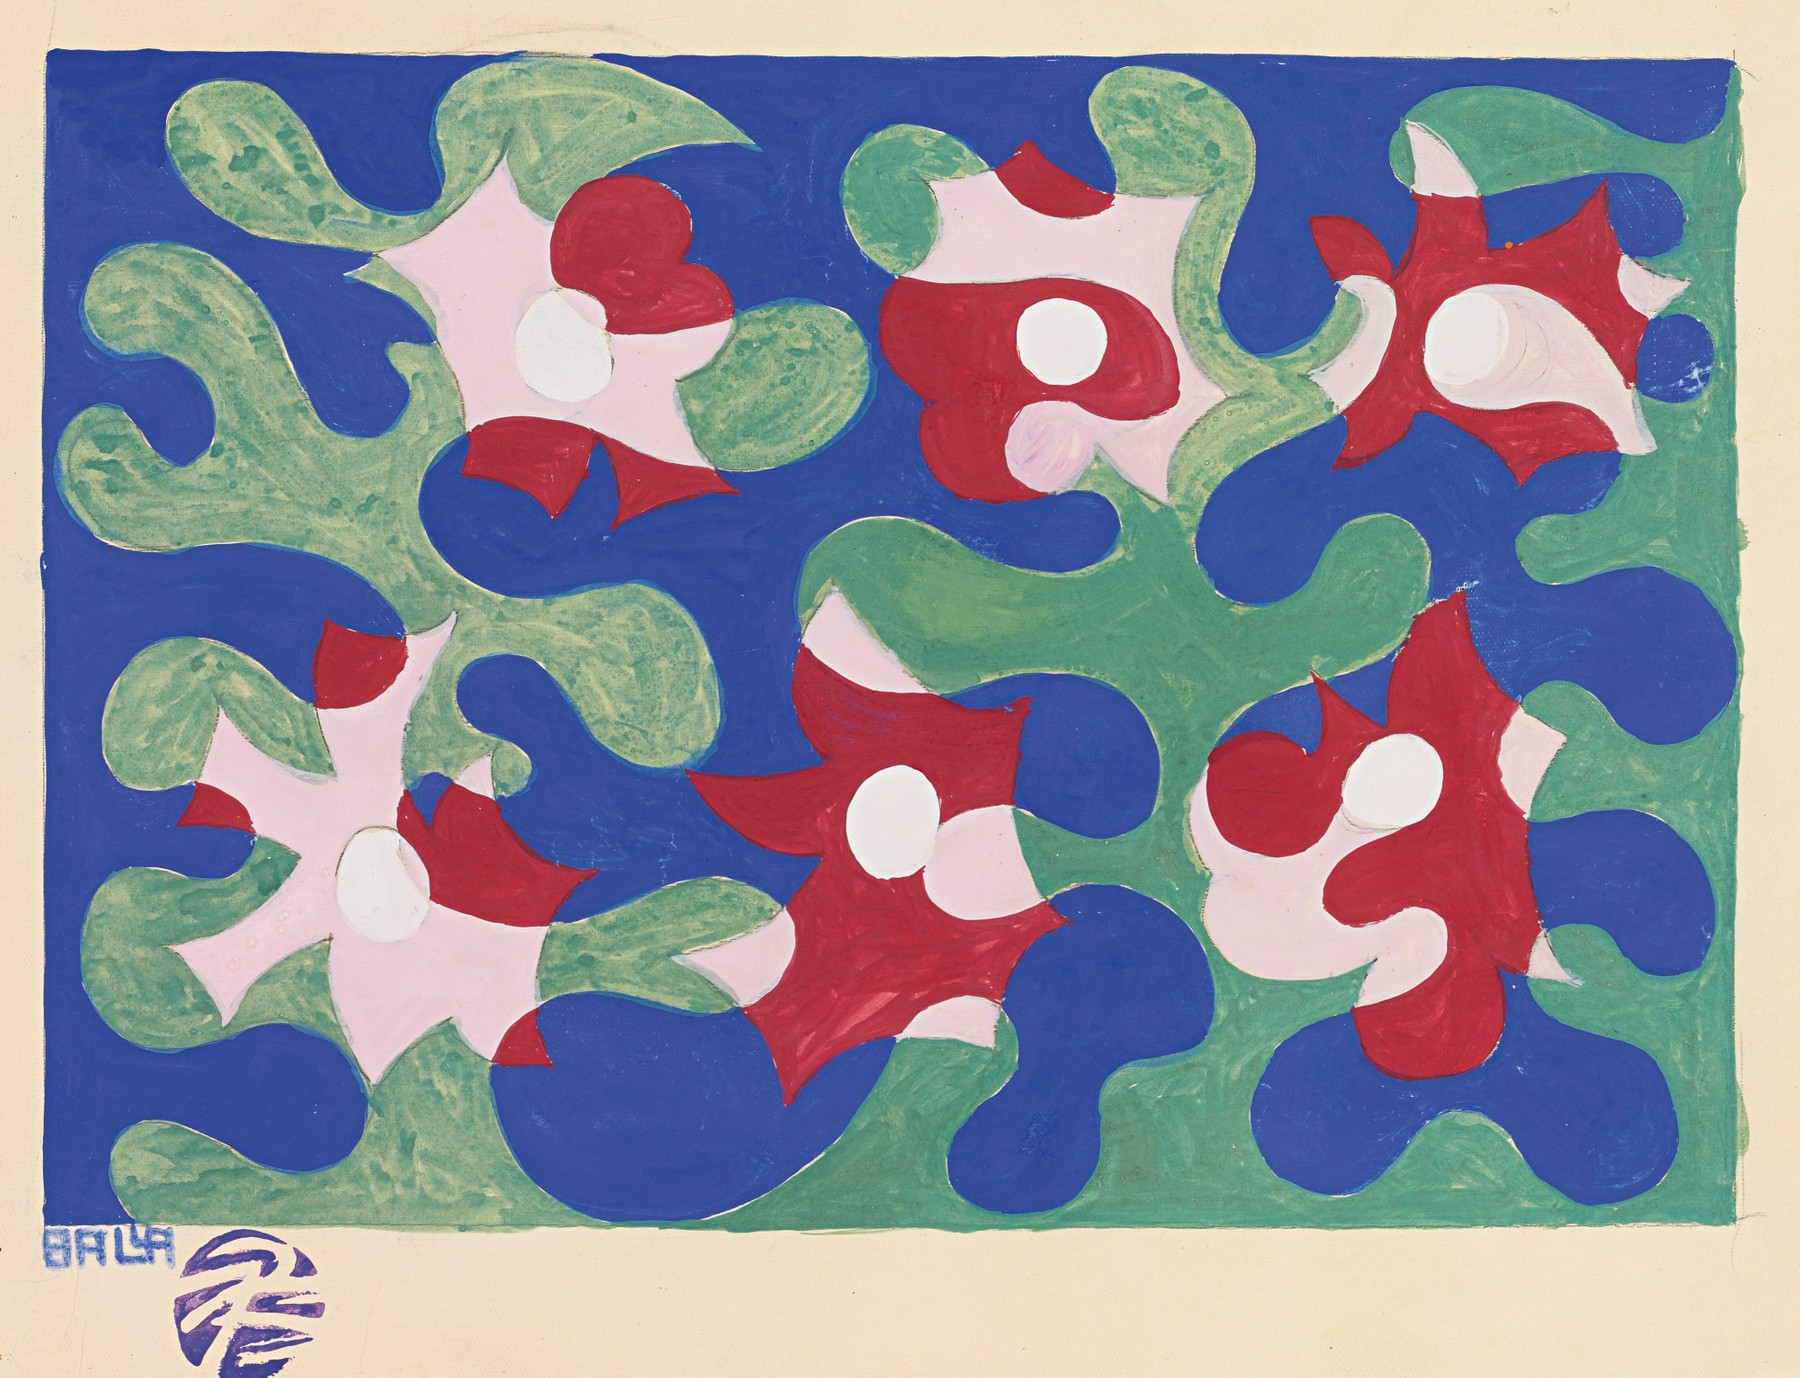 Giacomo Balla, Fiori e Linee Andamentali (Flowers and Lines Performing), 1919